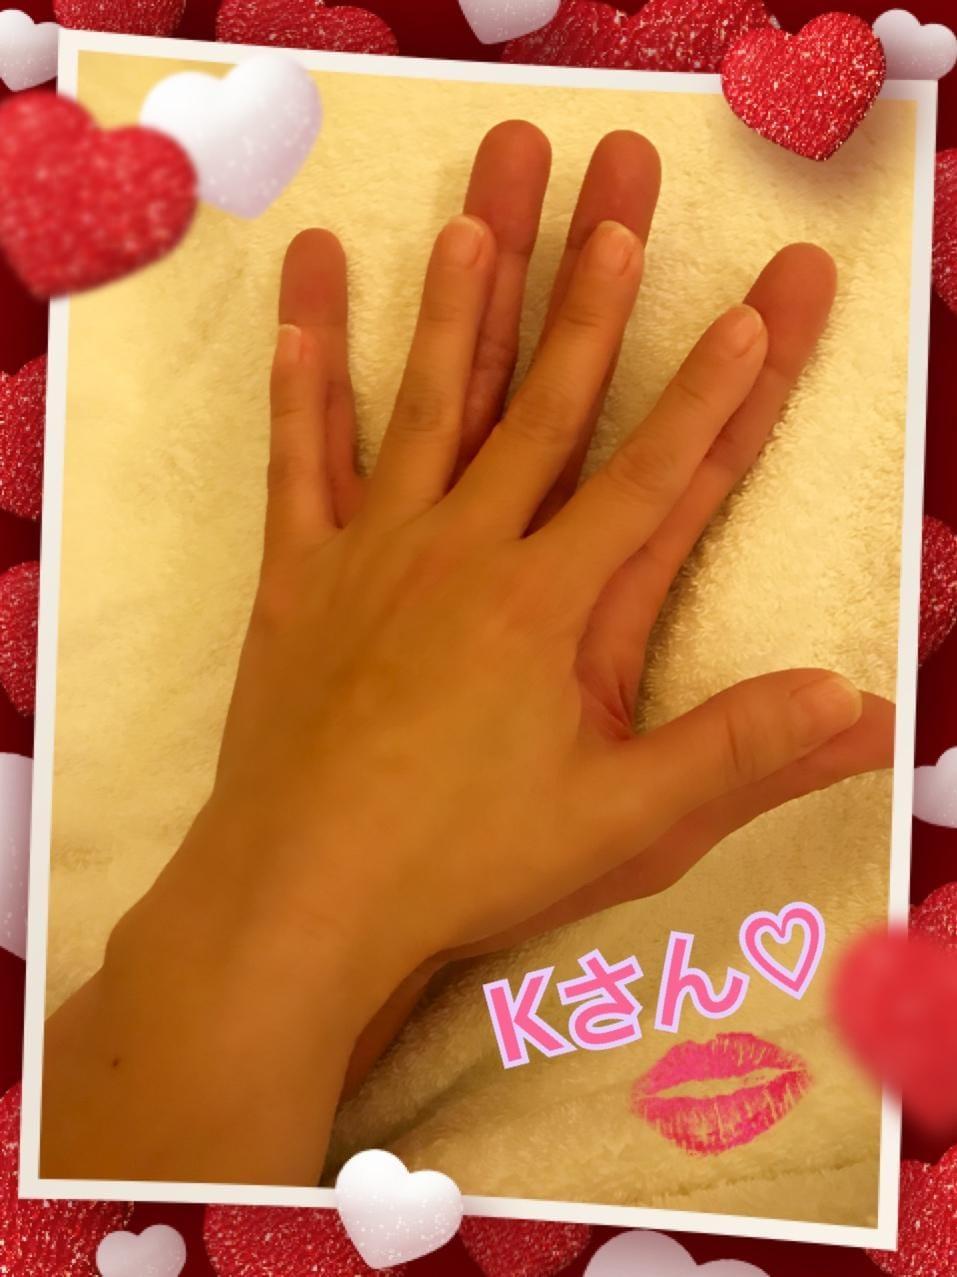 「K様へ☆1月19日19時」01/21(01/21) 01:16   大塚【おおつか】の写メ・風俗動画